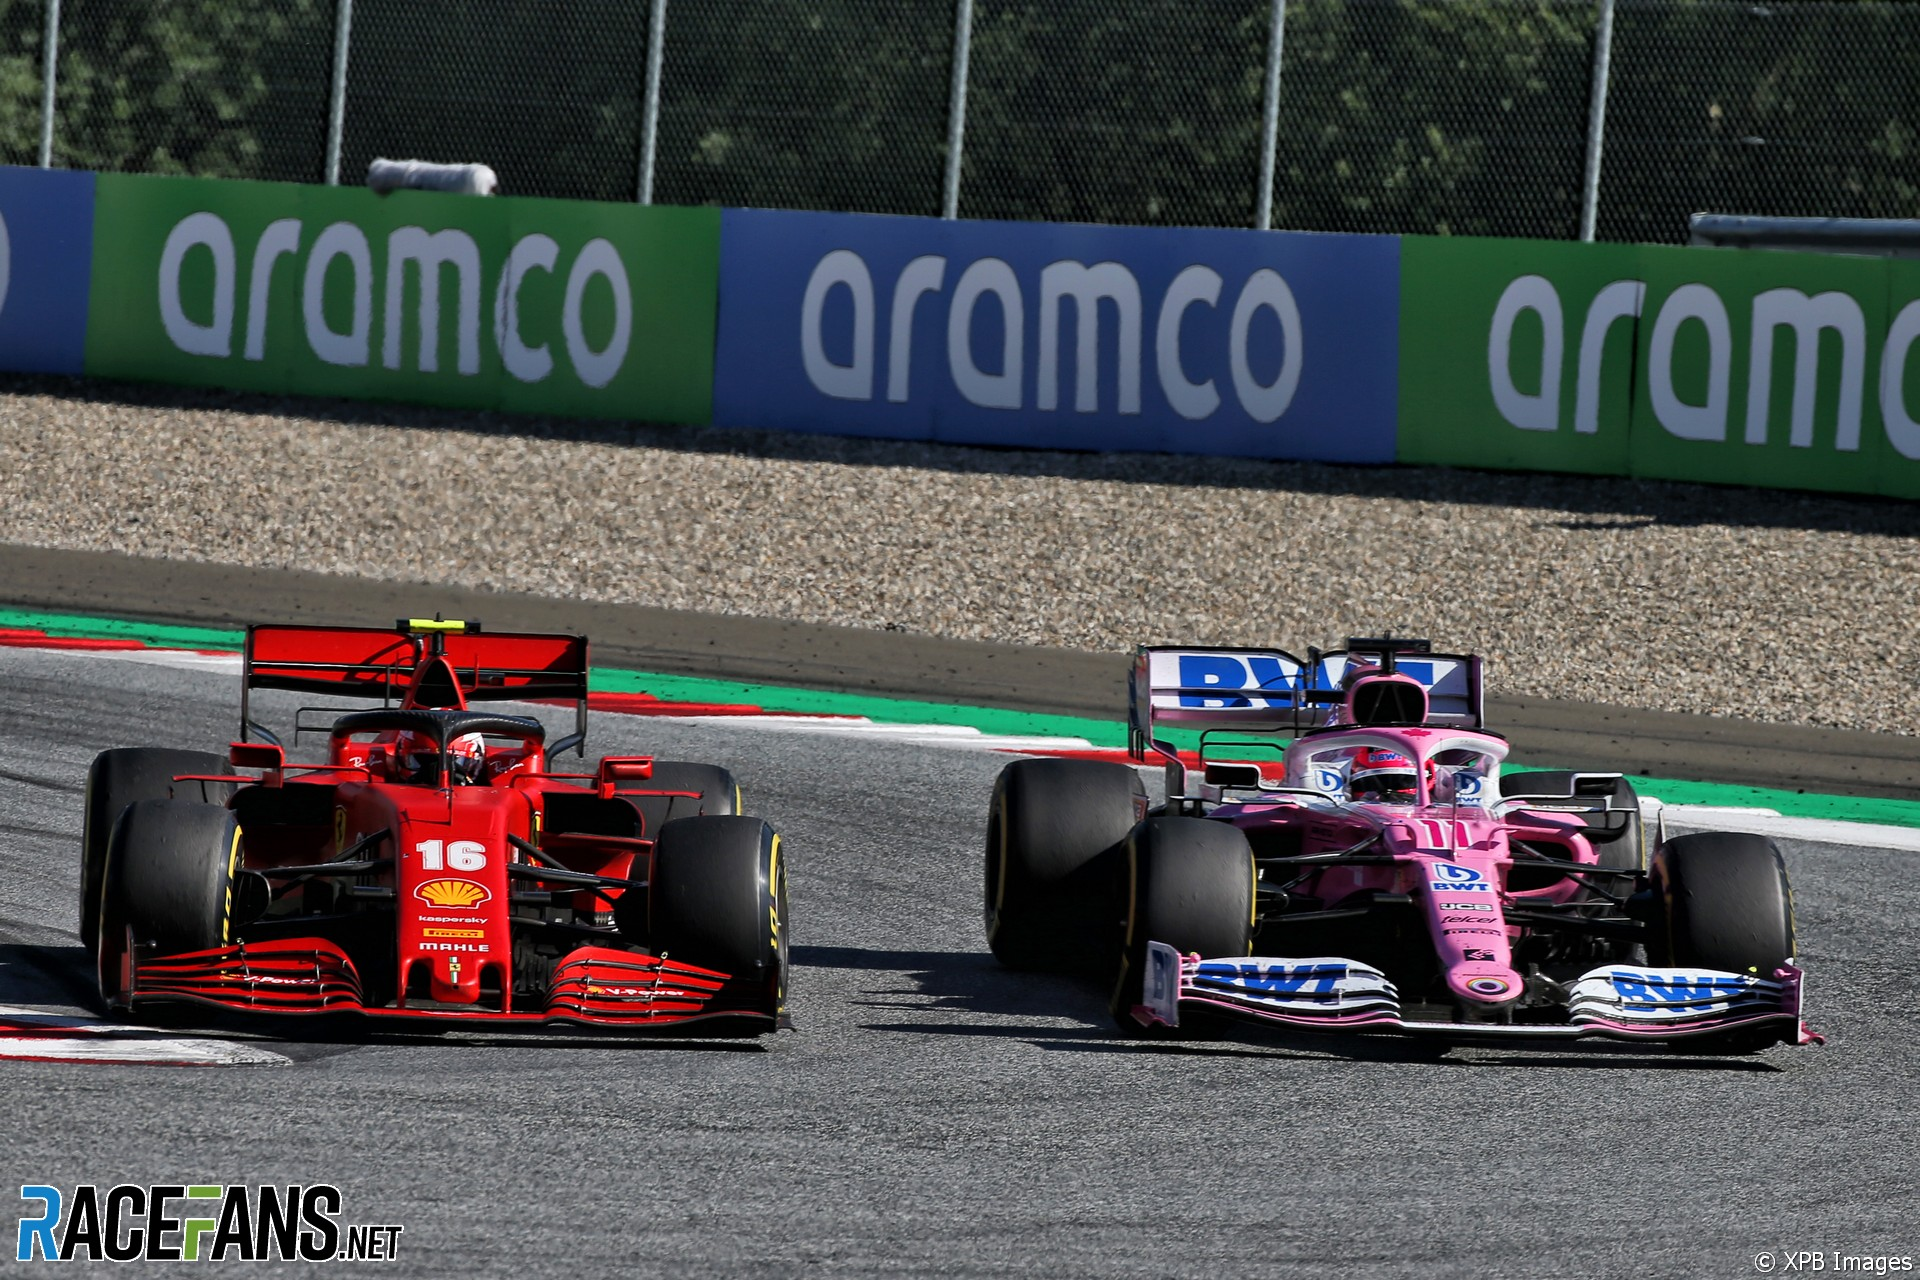 Charles Leclerc, Sergio Perez, Red Bull Ring, 2020